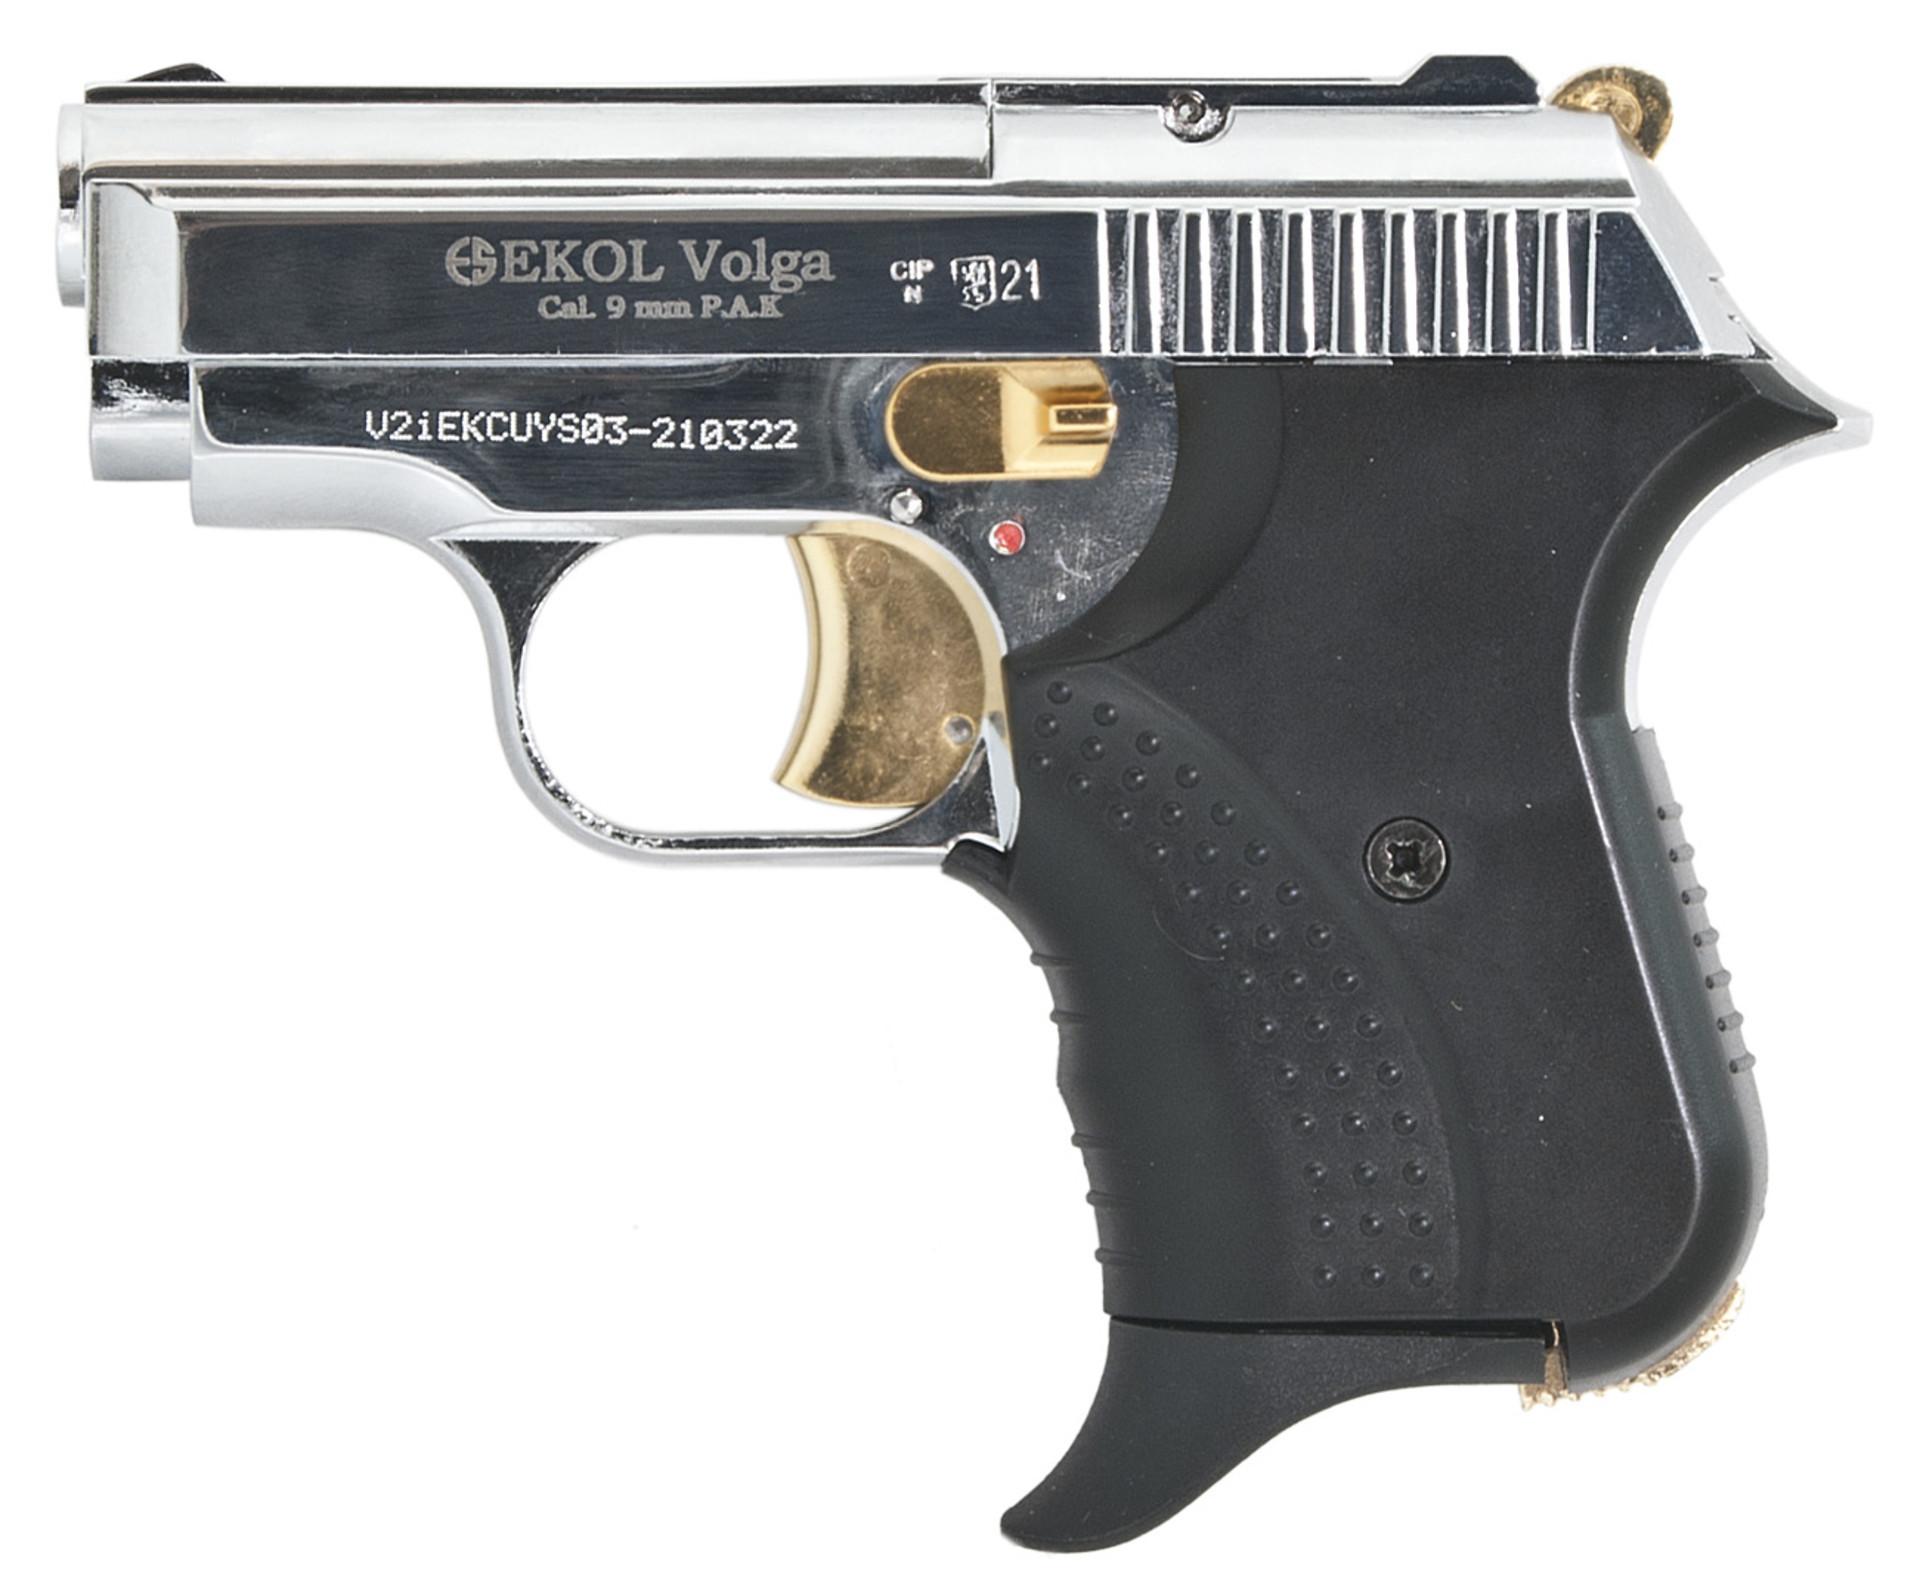 Pistolet gazowy Ekol Agent Volga chrom gold z ryciną kal.9mm